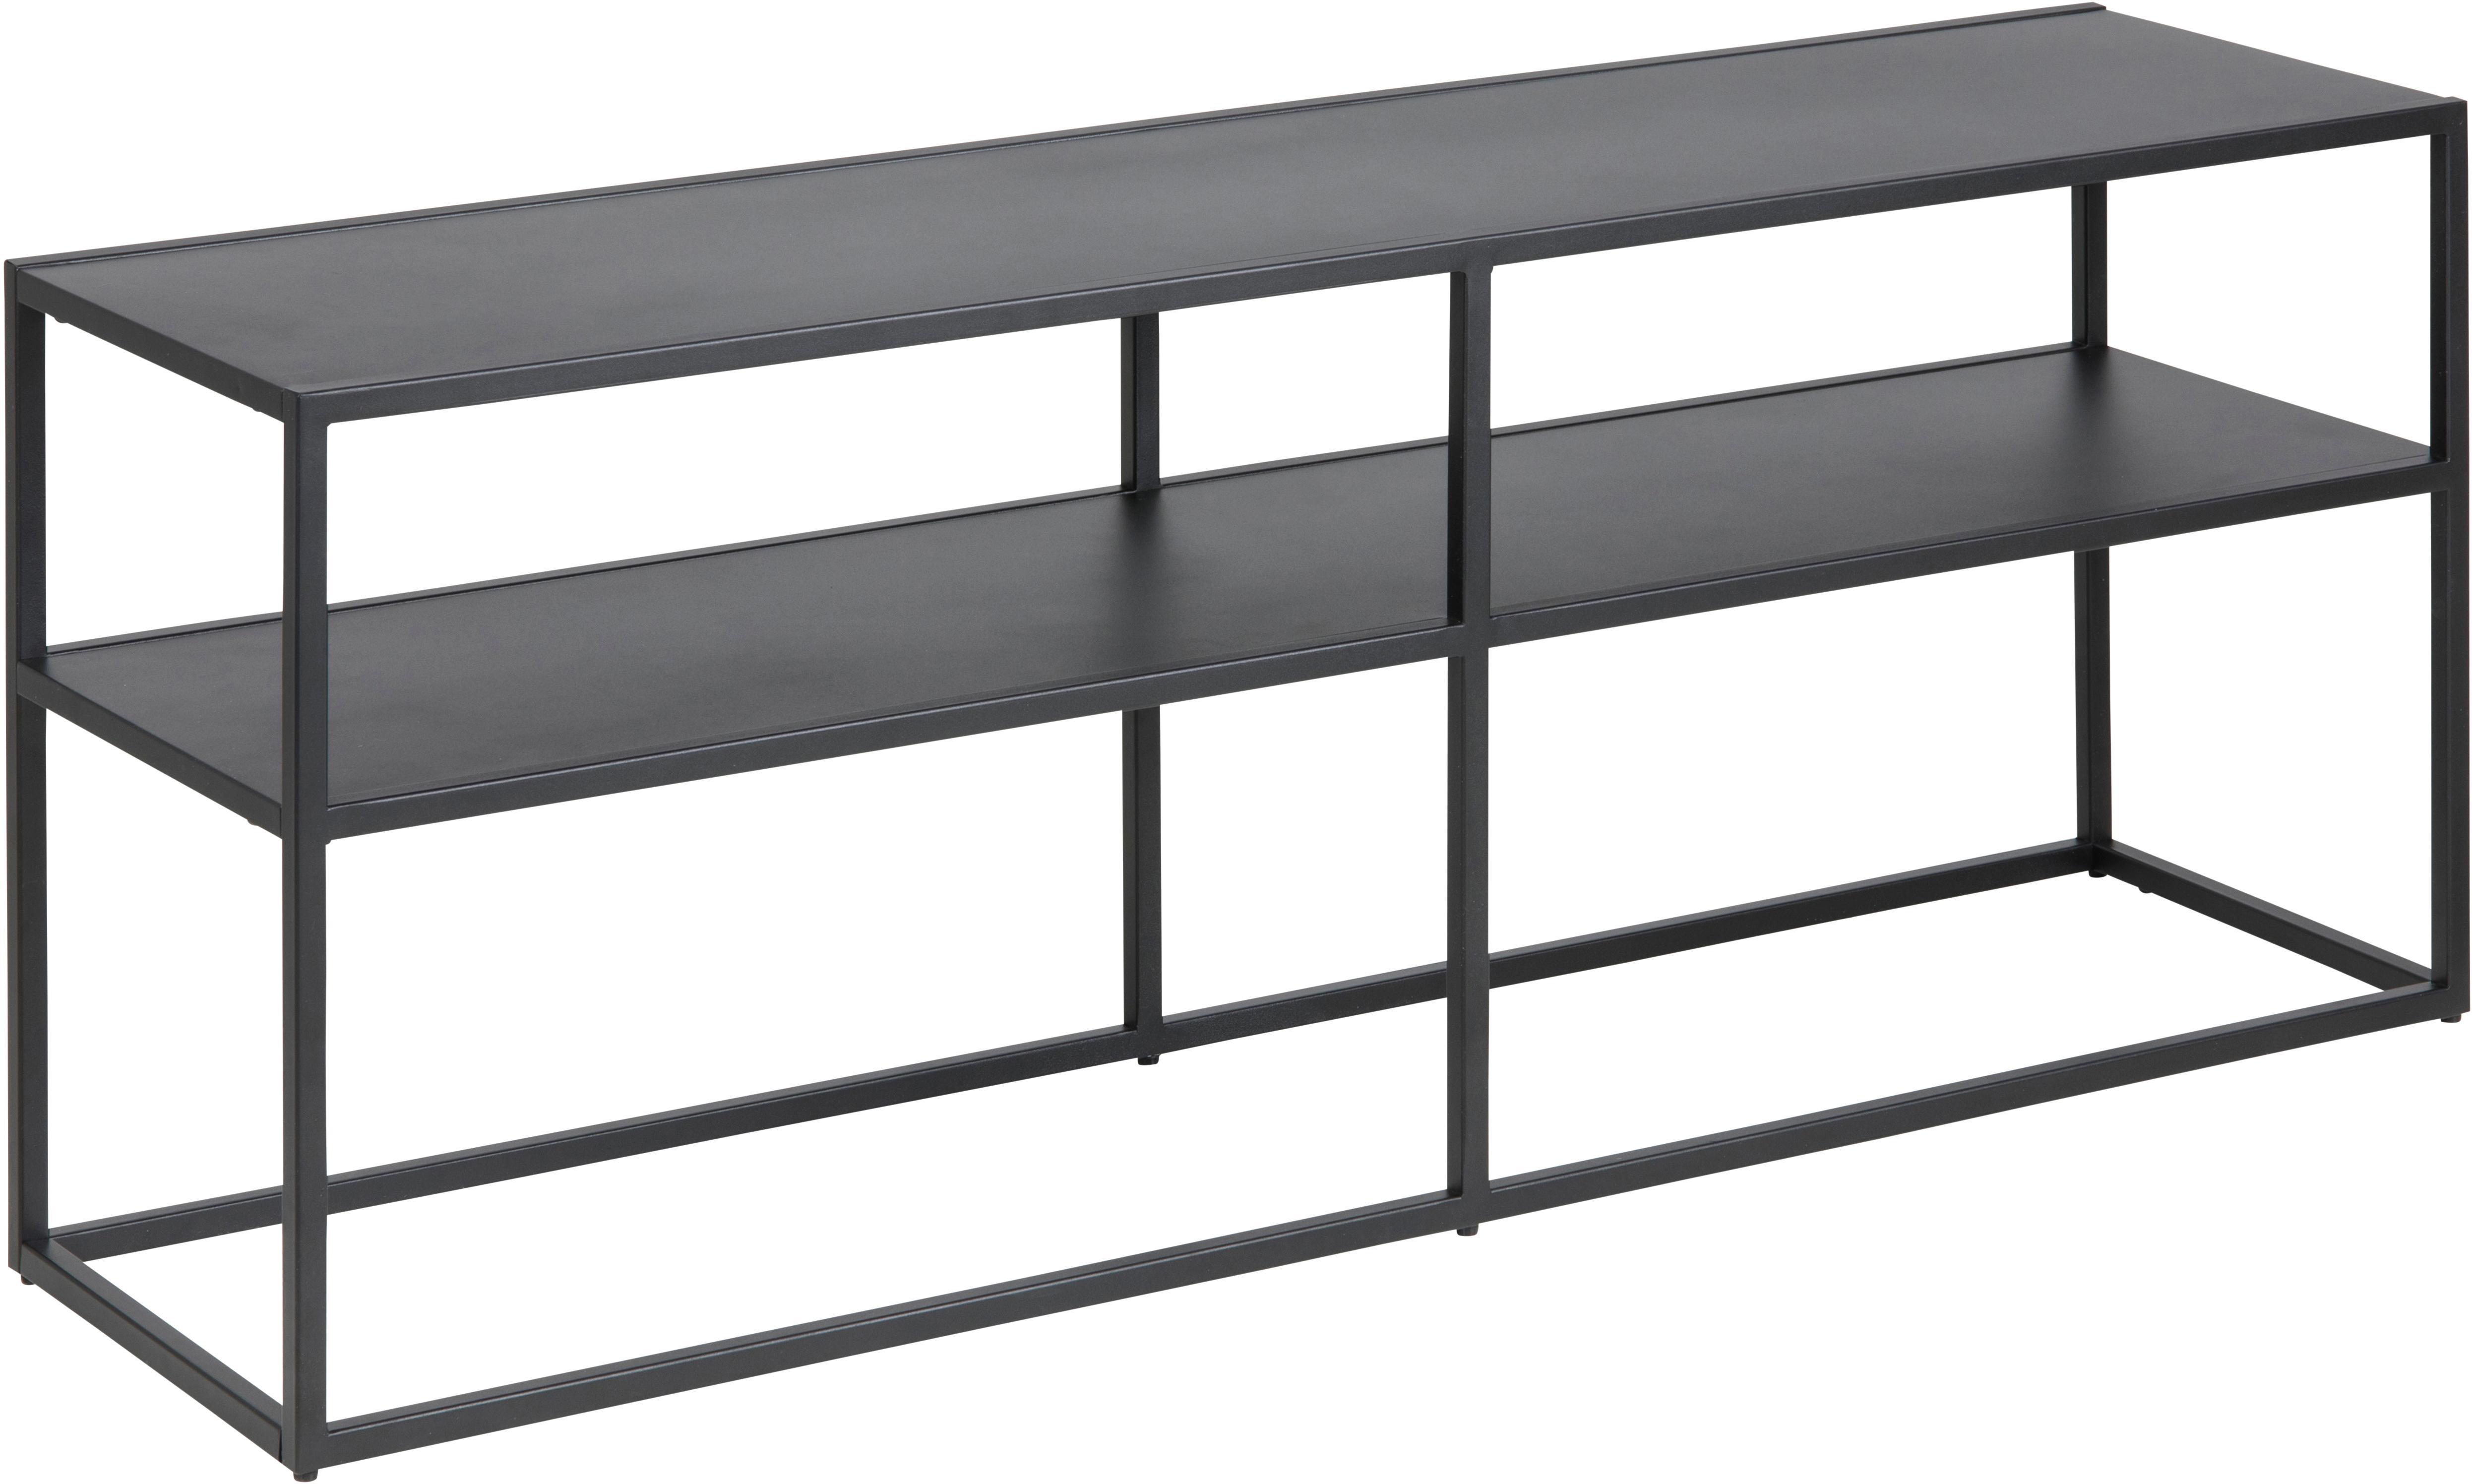 Aparador de metal Newton, Metal con pintura en polvo, Negro, An 120 x Al 46 cm